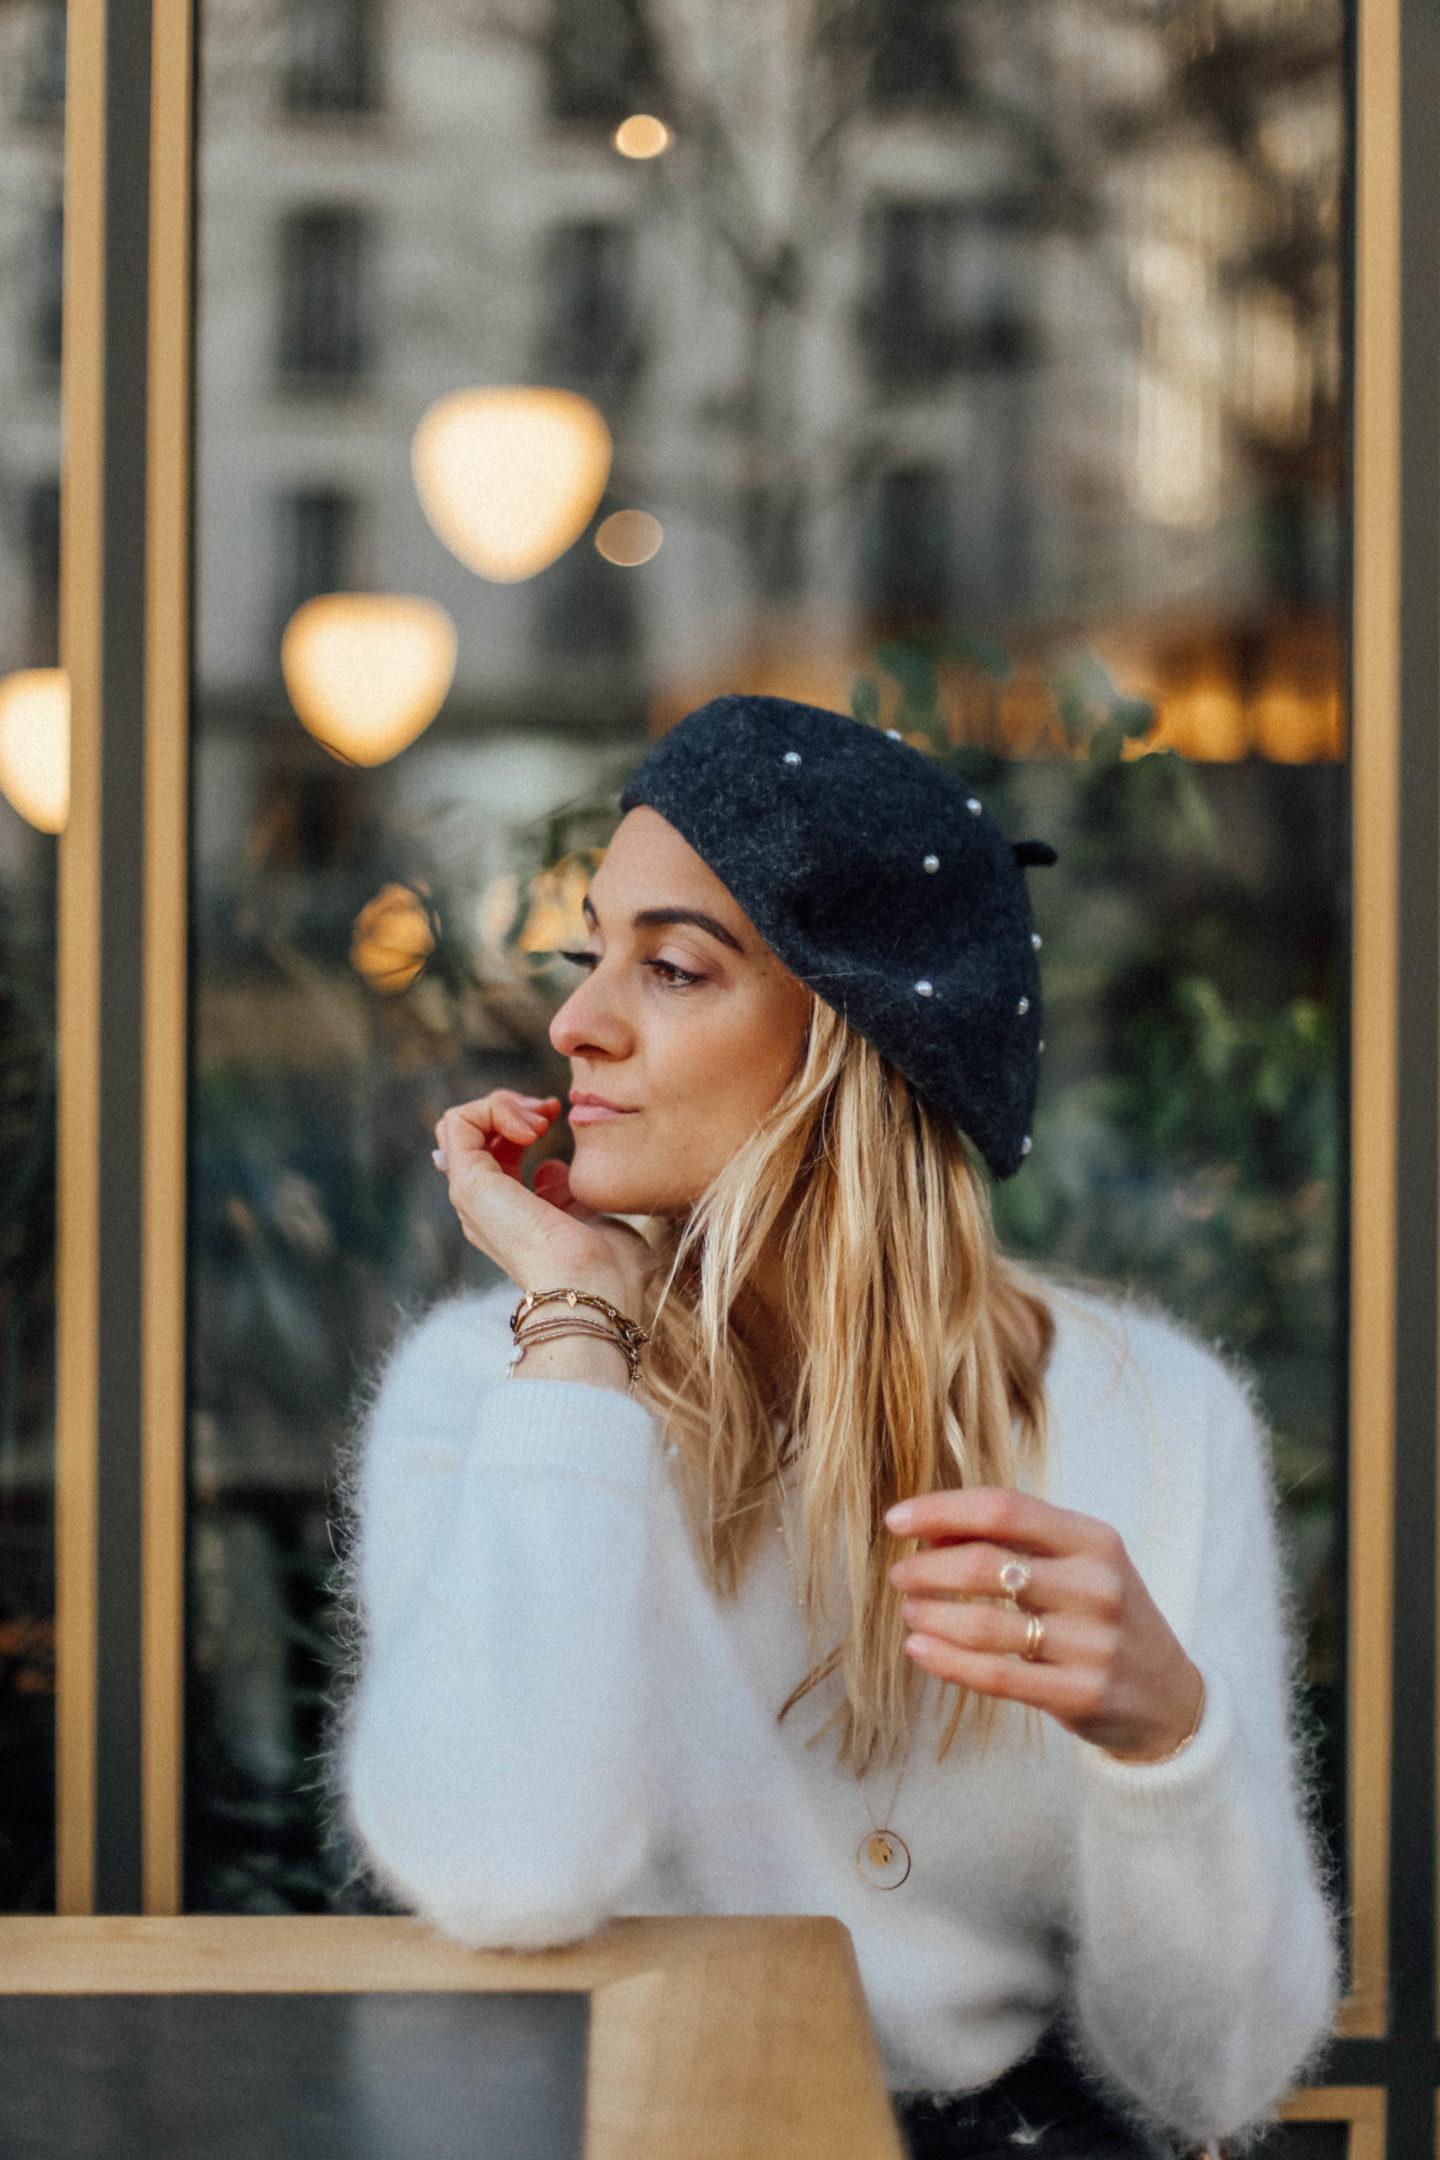 Pull Angora Anamour Paris - Blondie Baby blog mode et voyages